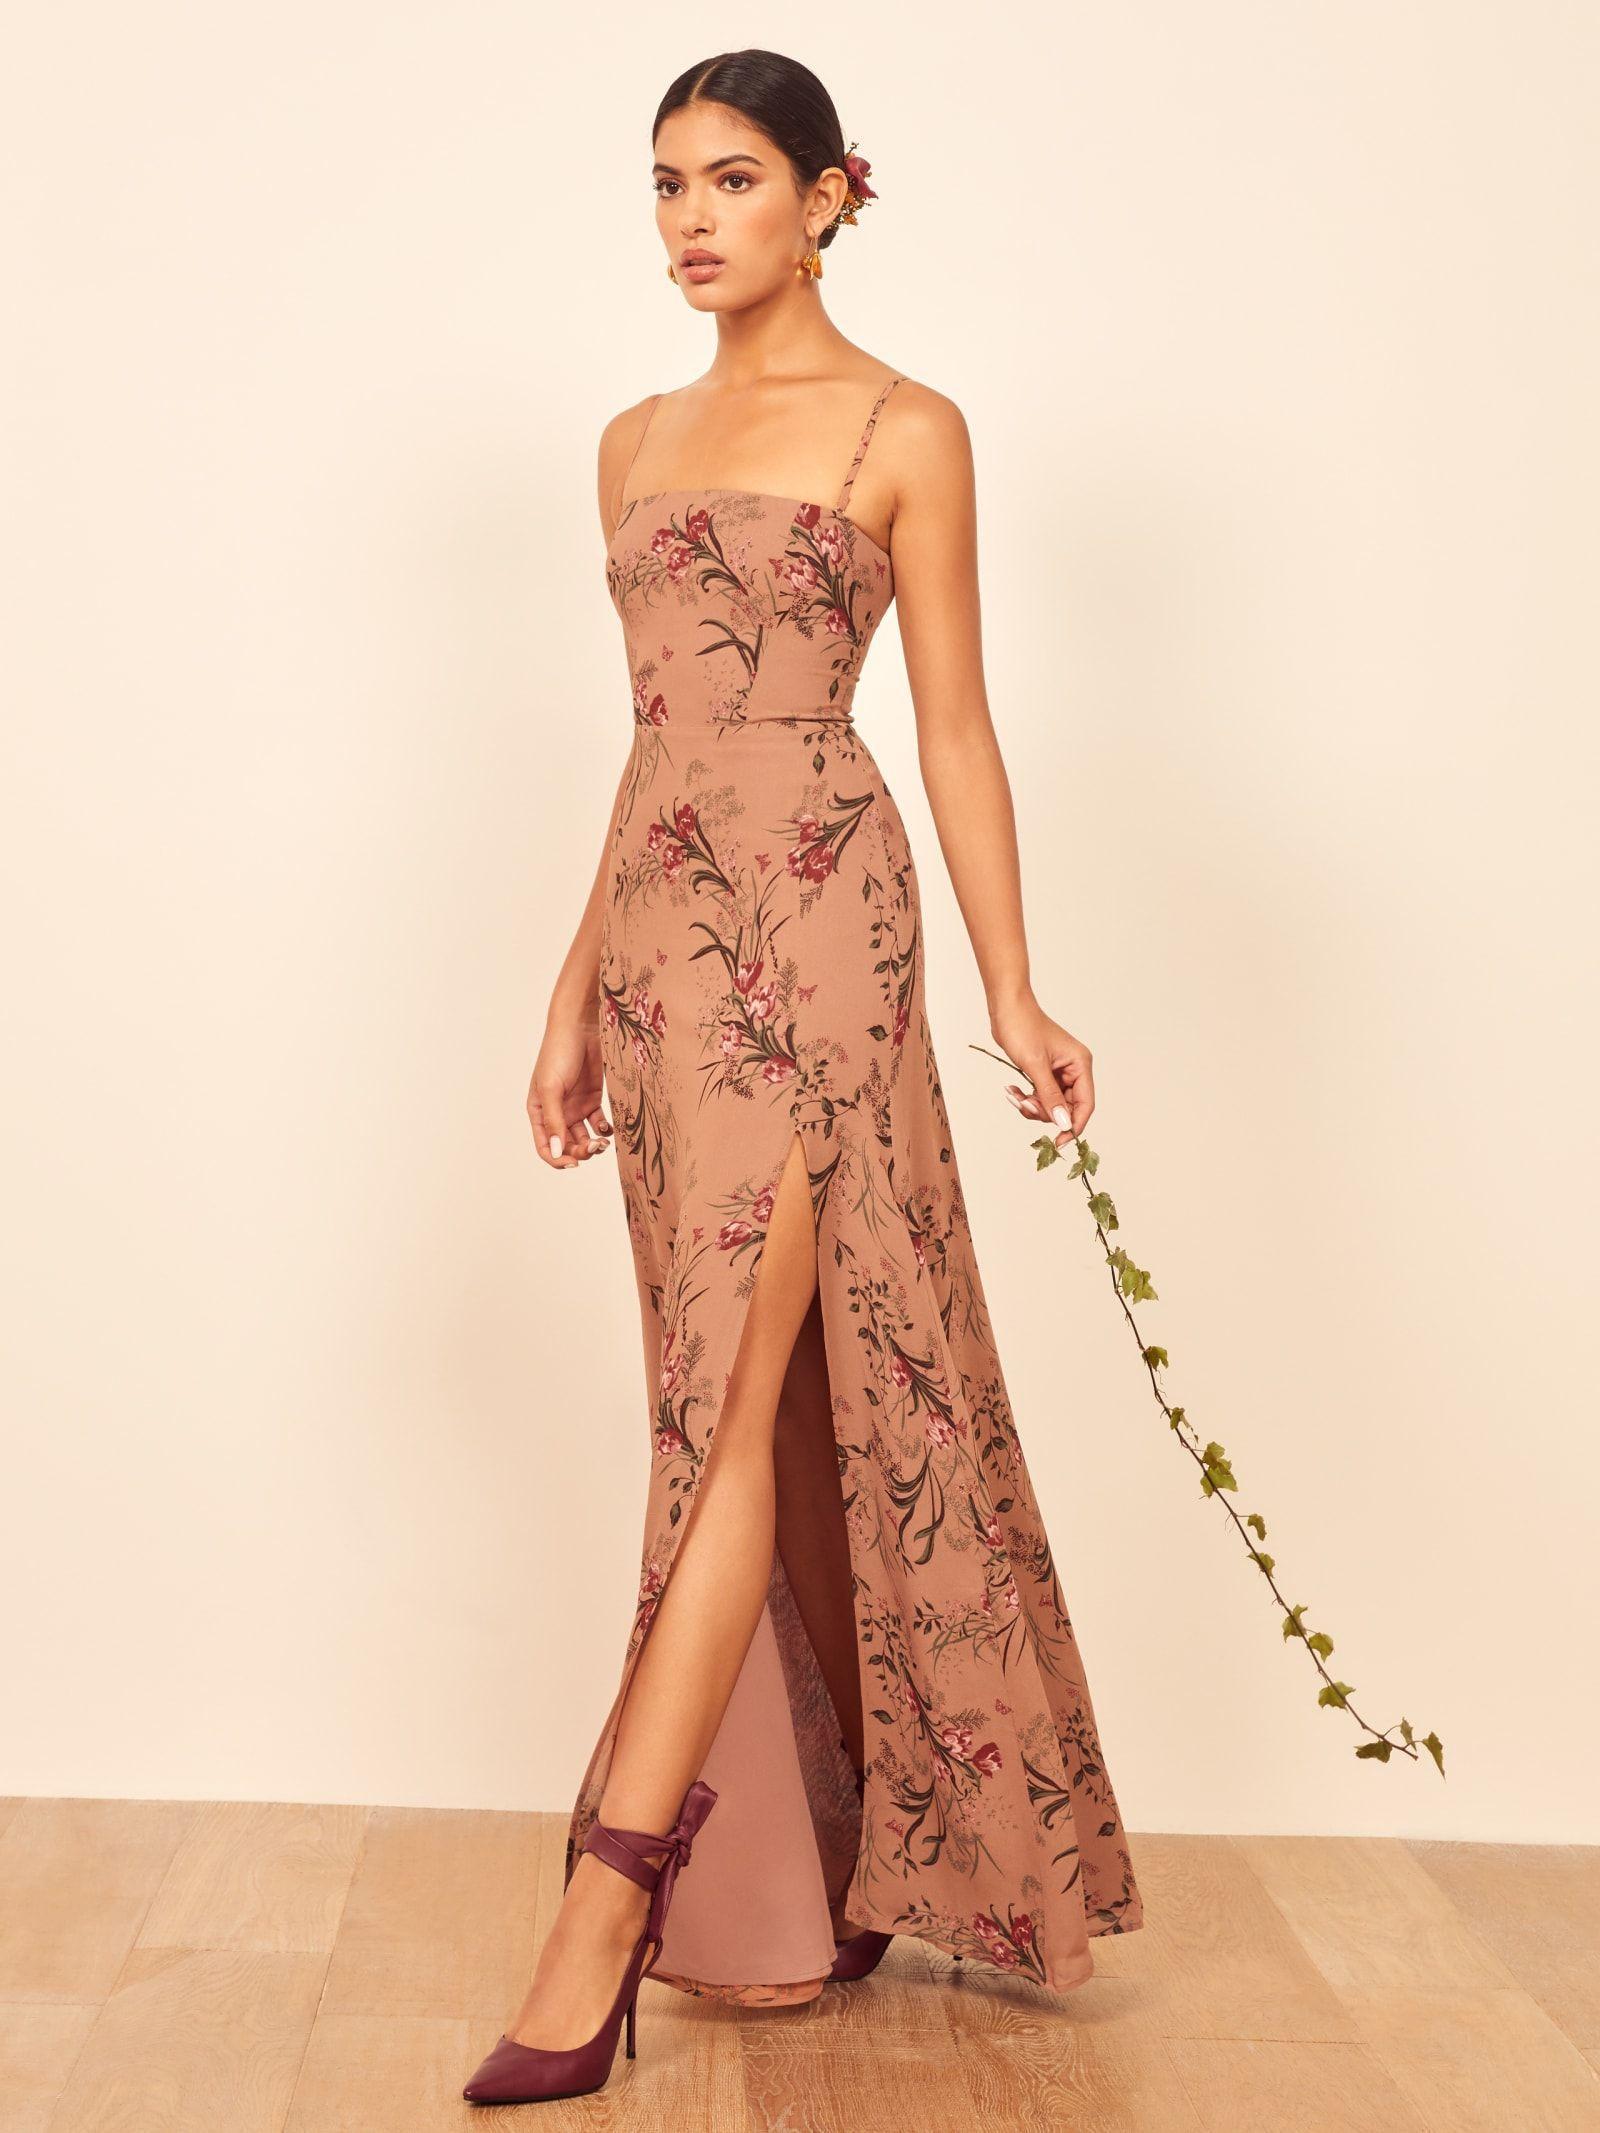 Pin On Dress Styles [ 2133 x 1600 Pixel ]